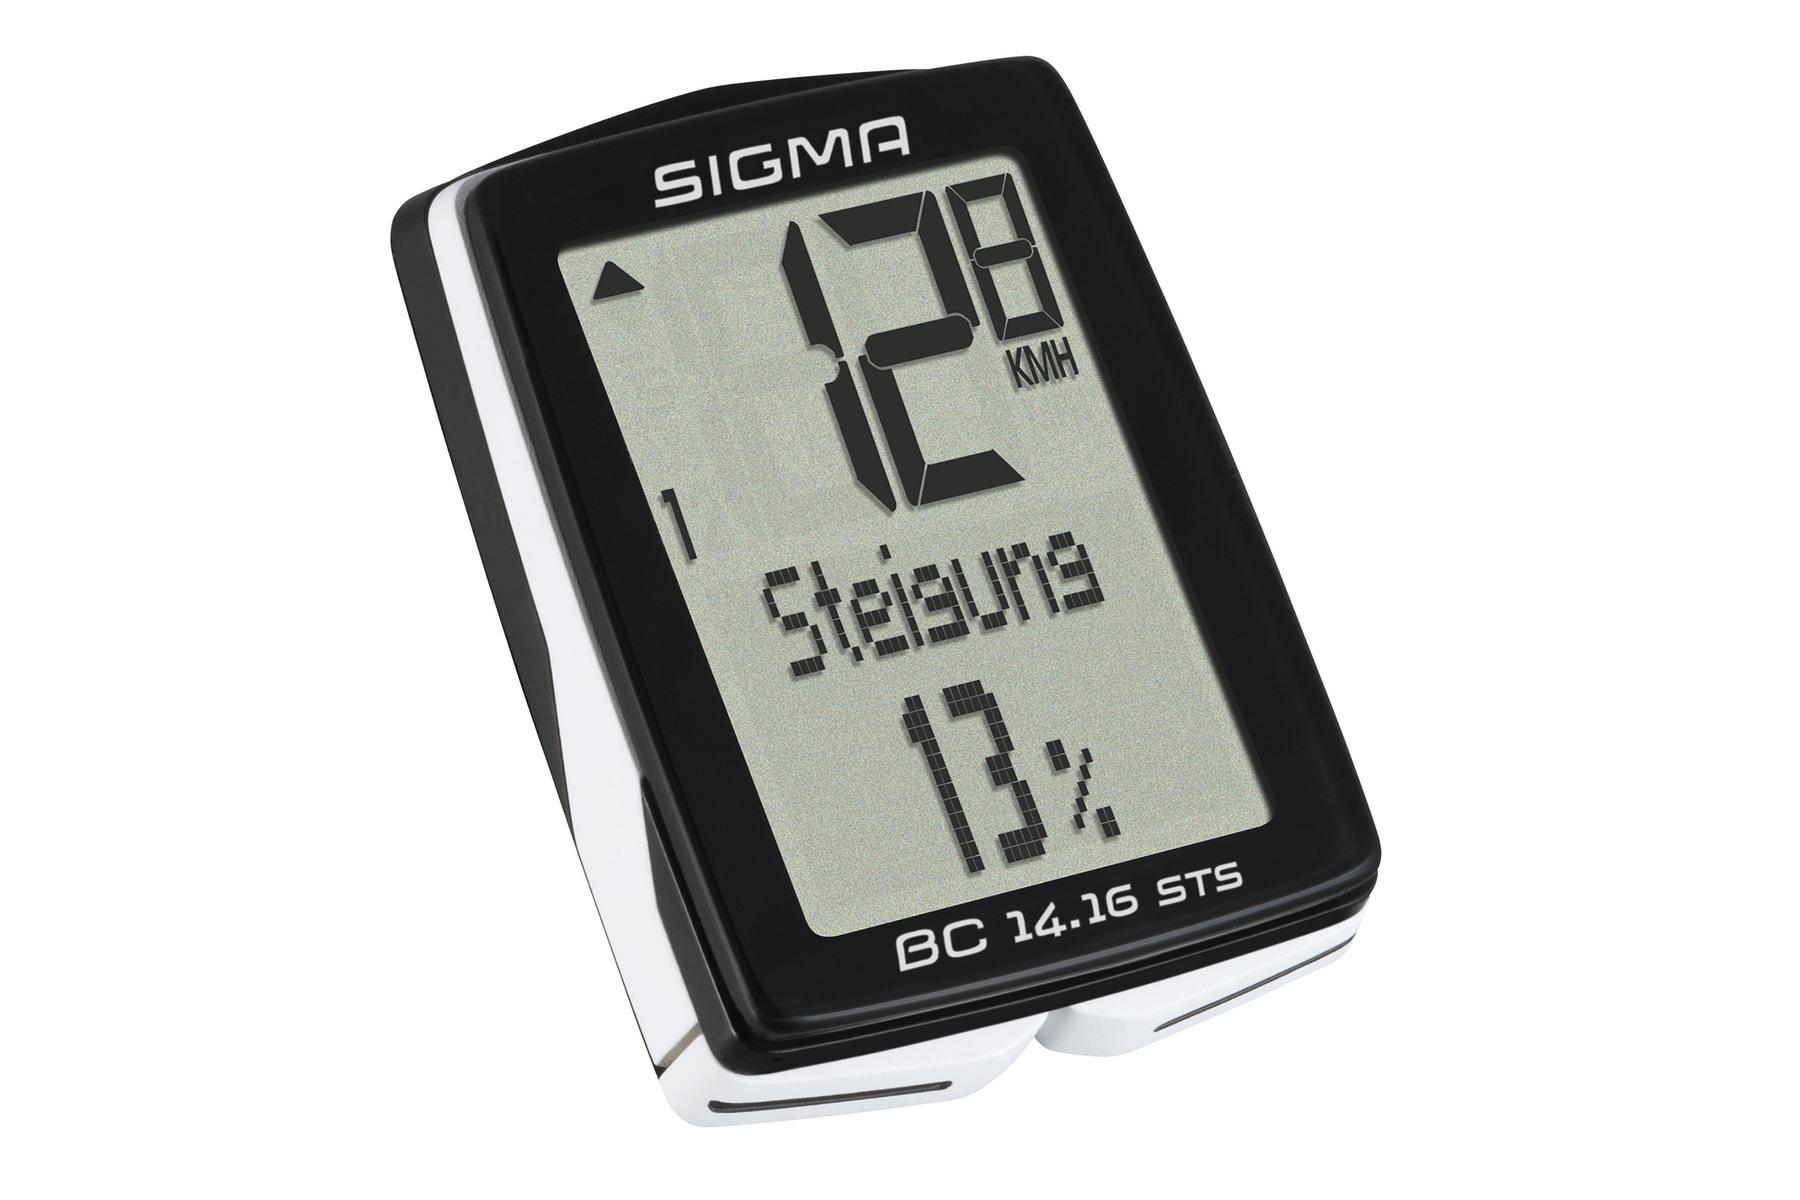 Sigma BC 14.16 STS Fahrradcomputer -kabellos-